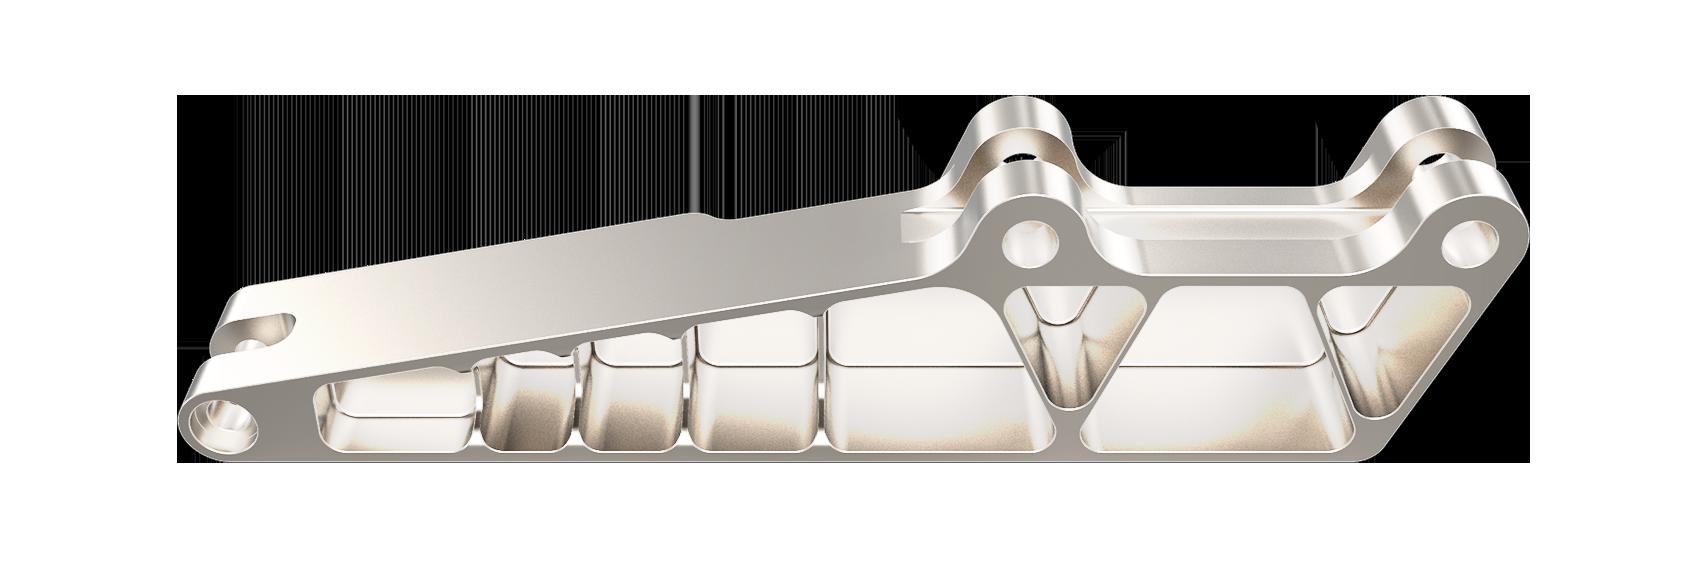 TITAN-502